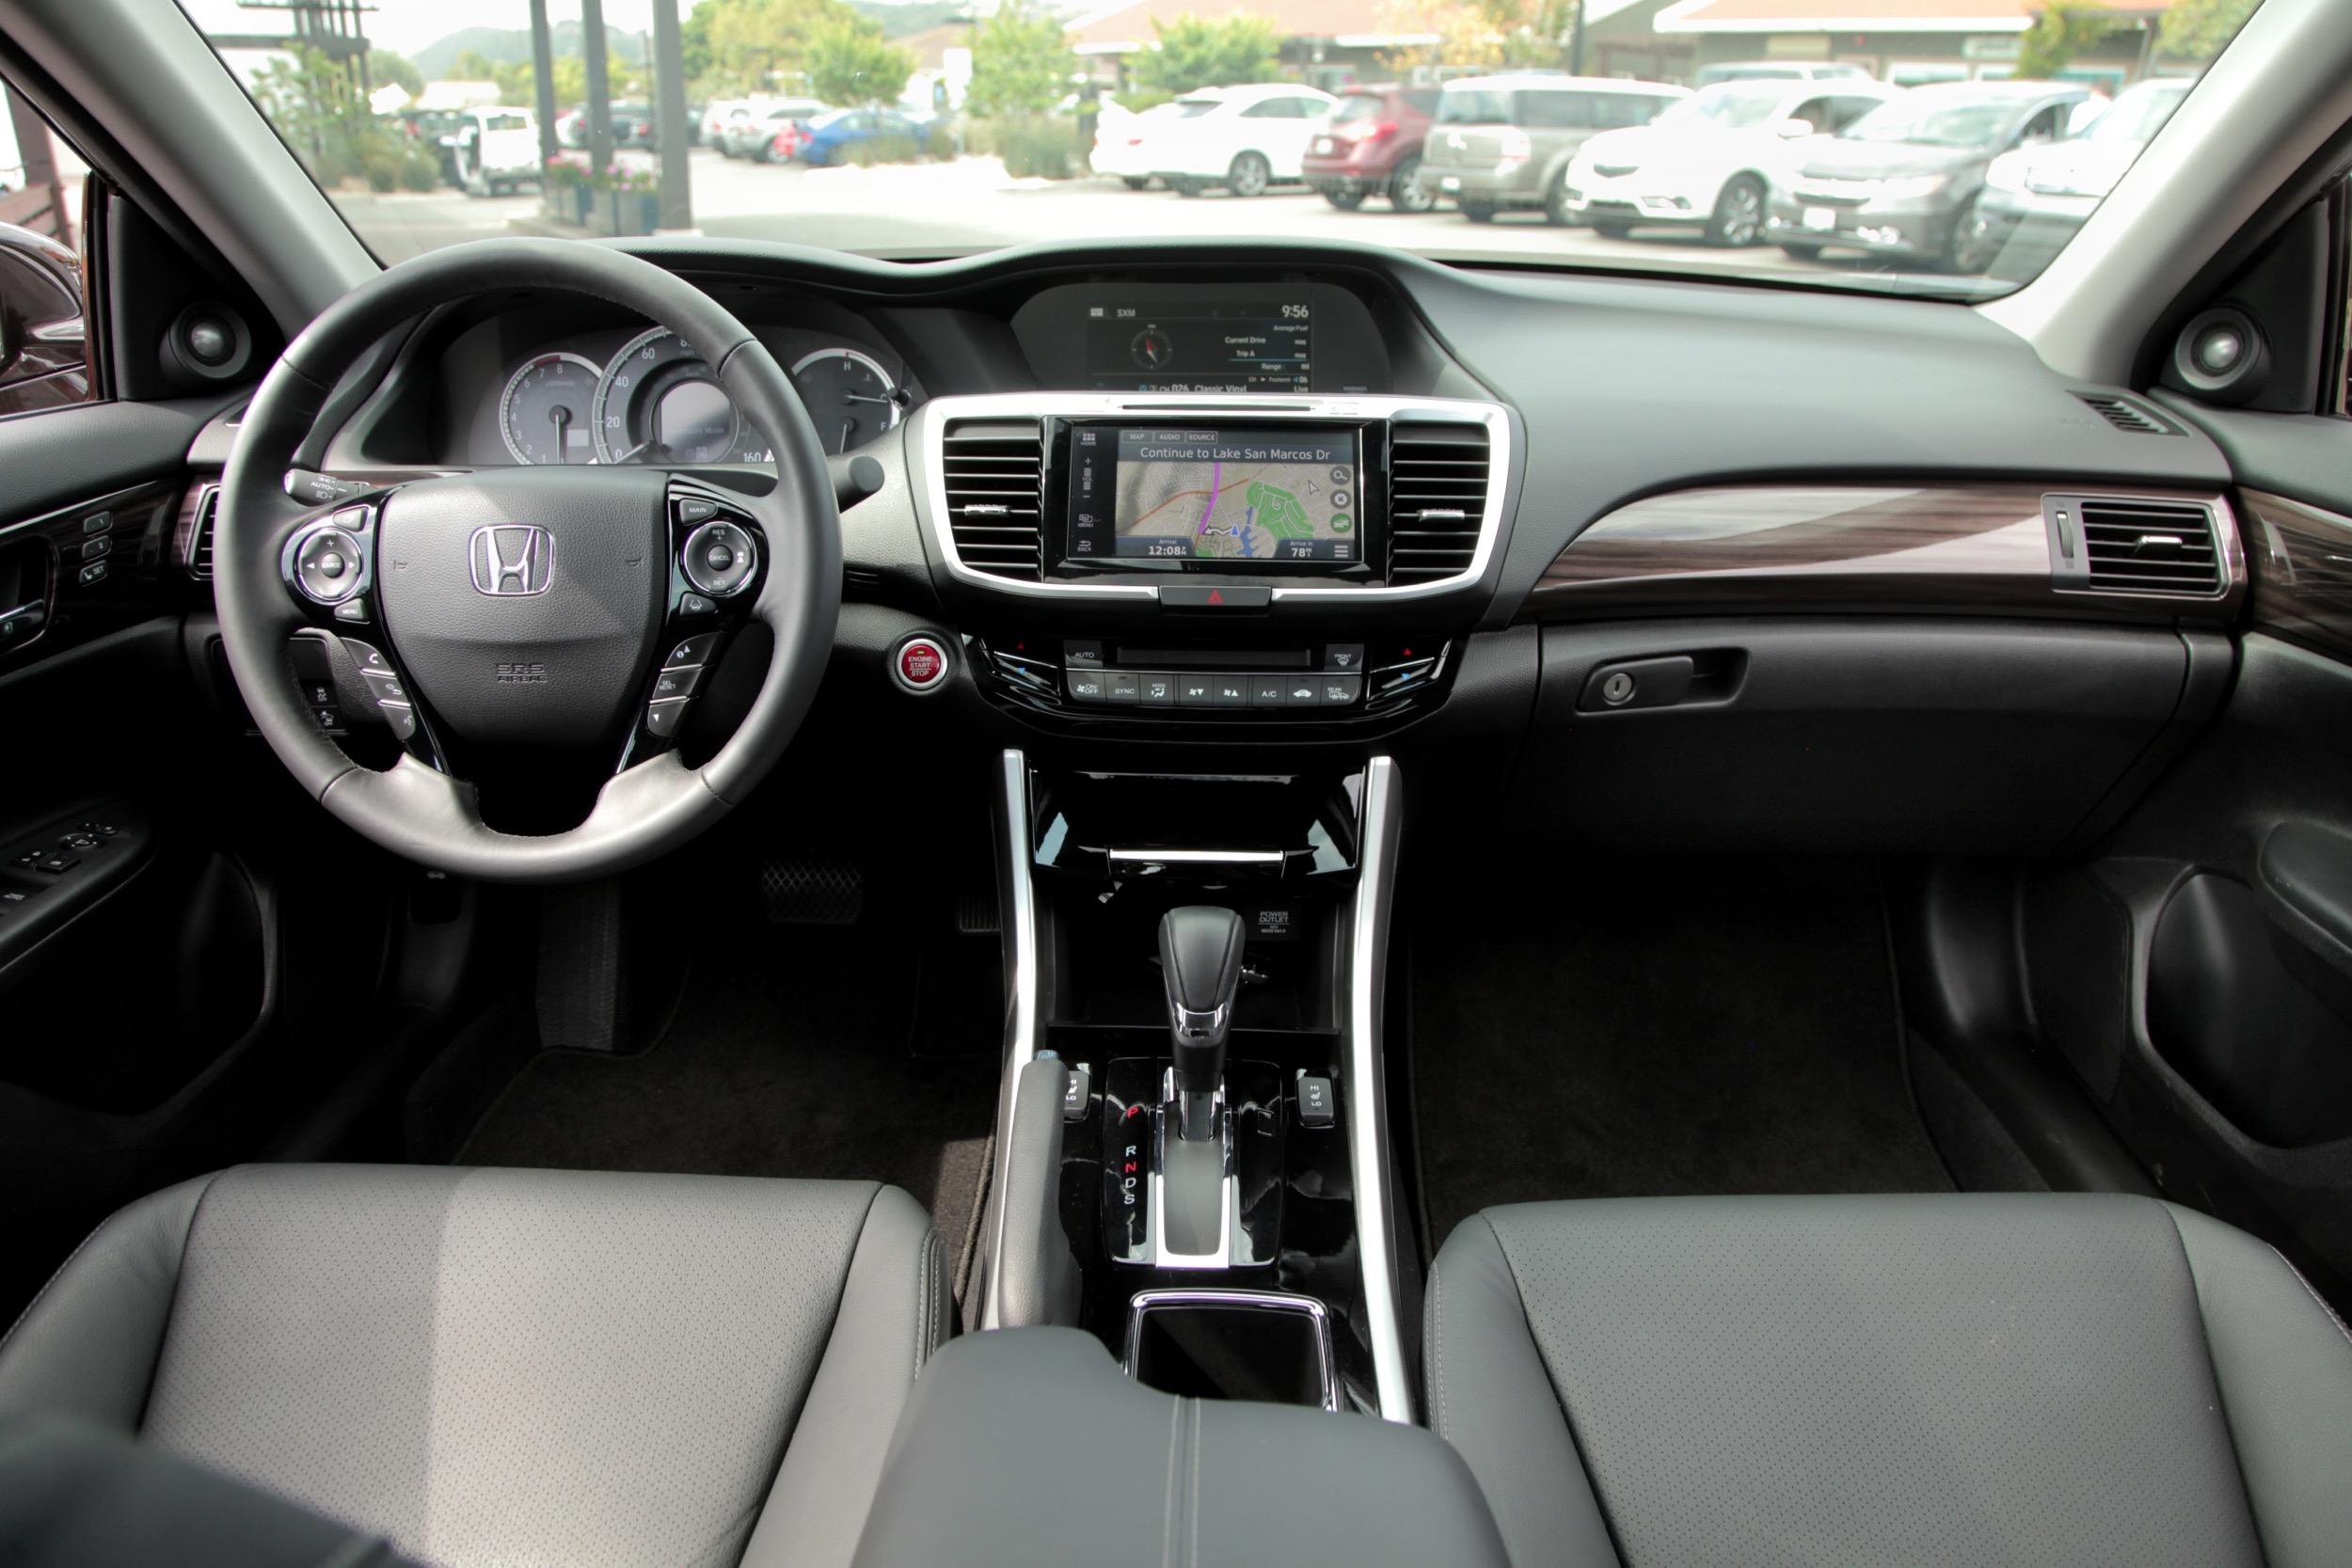 honda accord pricing starts at $ 22925 autoguide com news 2016 honda ...